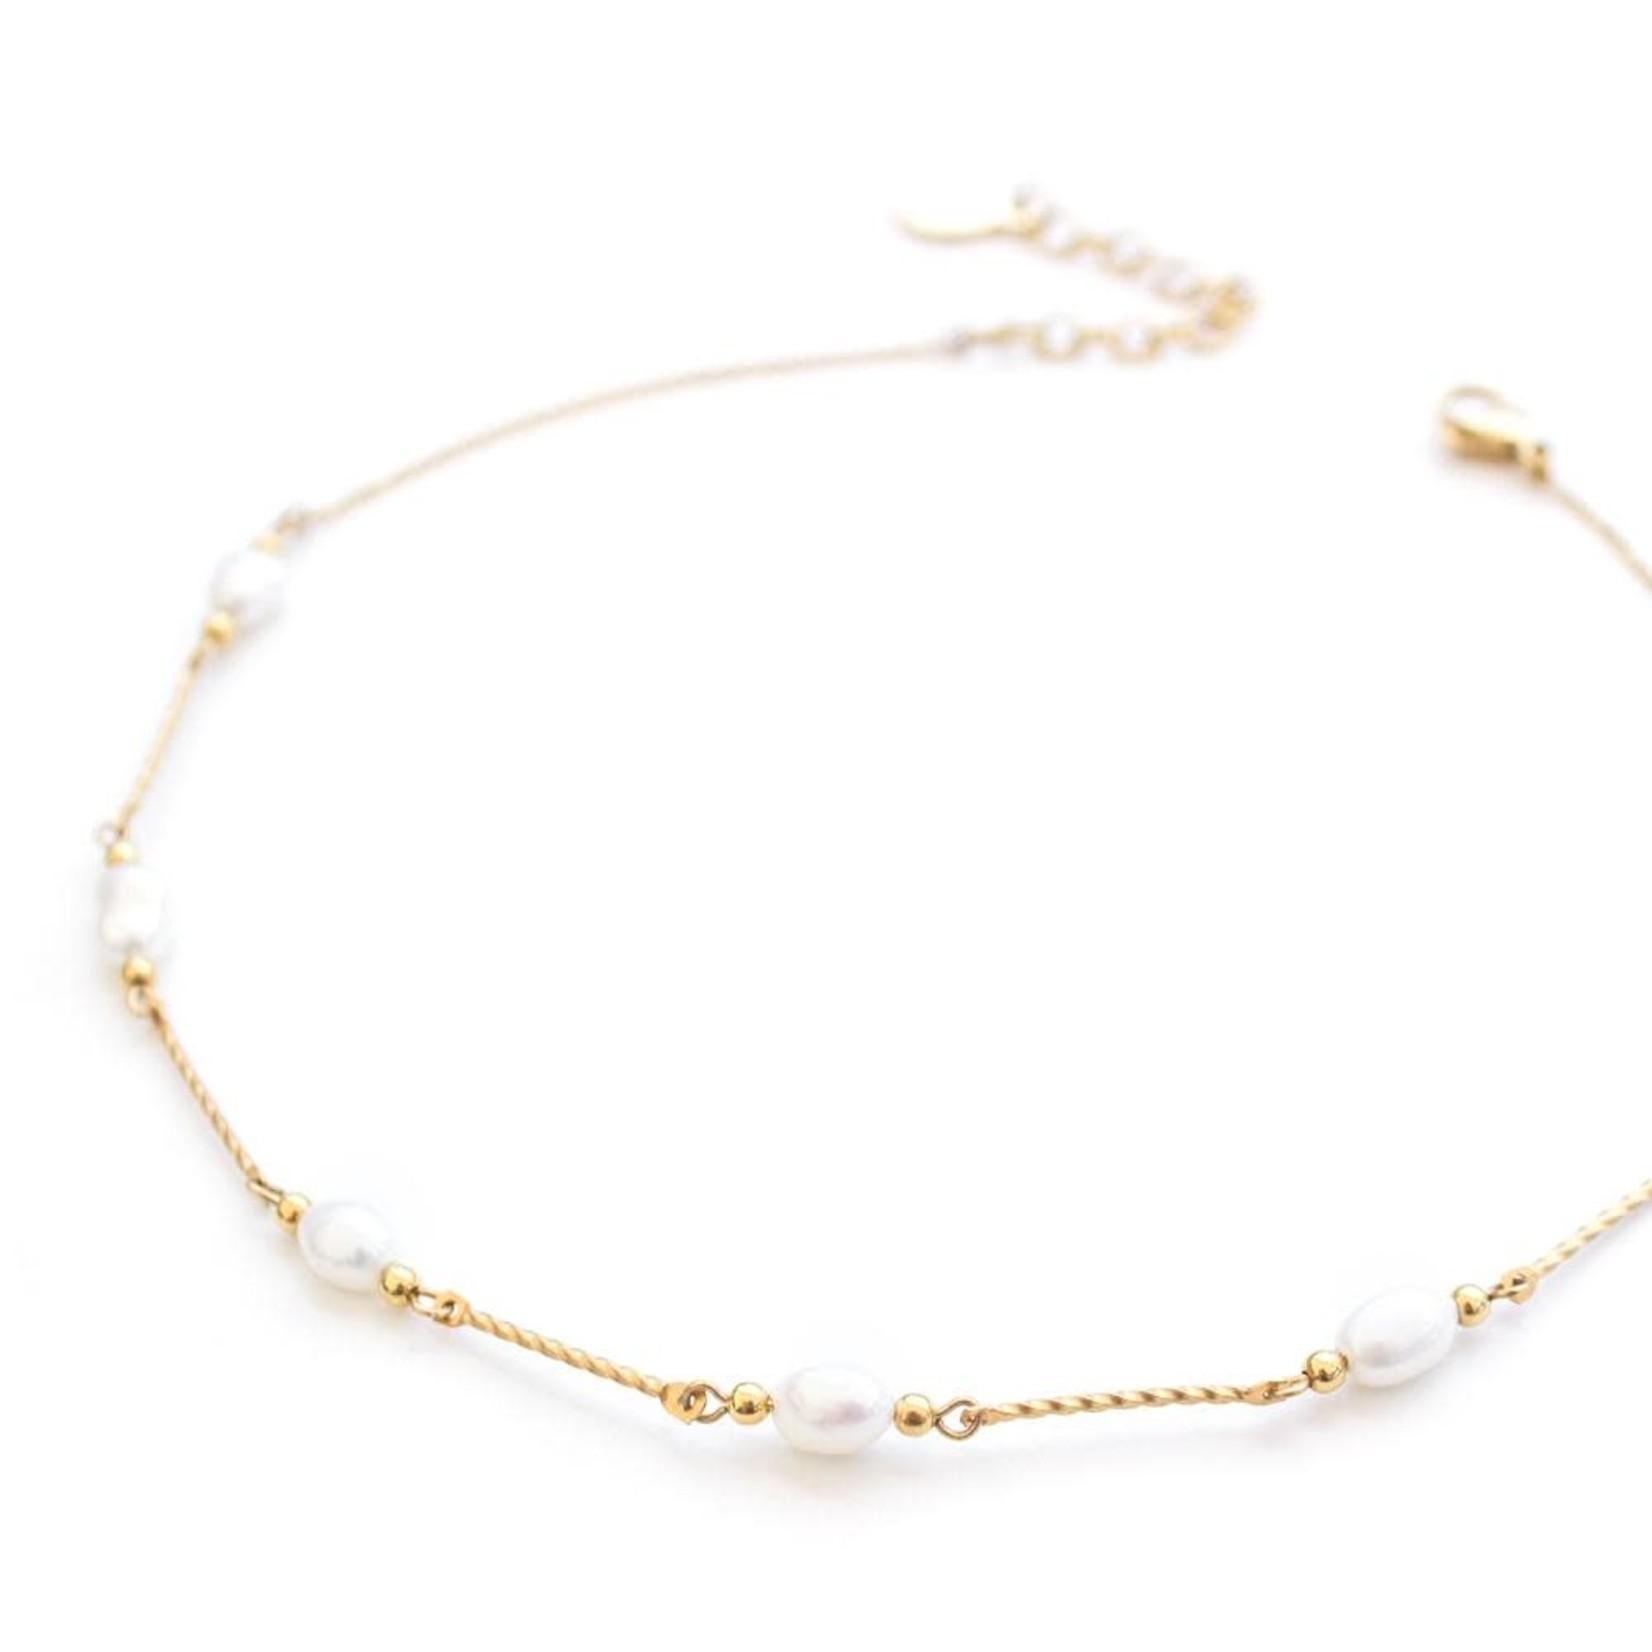 Welldunn jewelry Welldunn collier COCO or